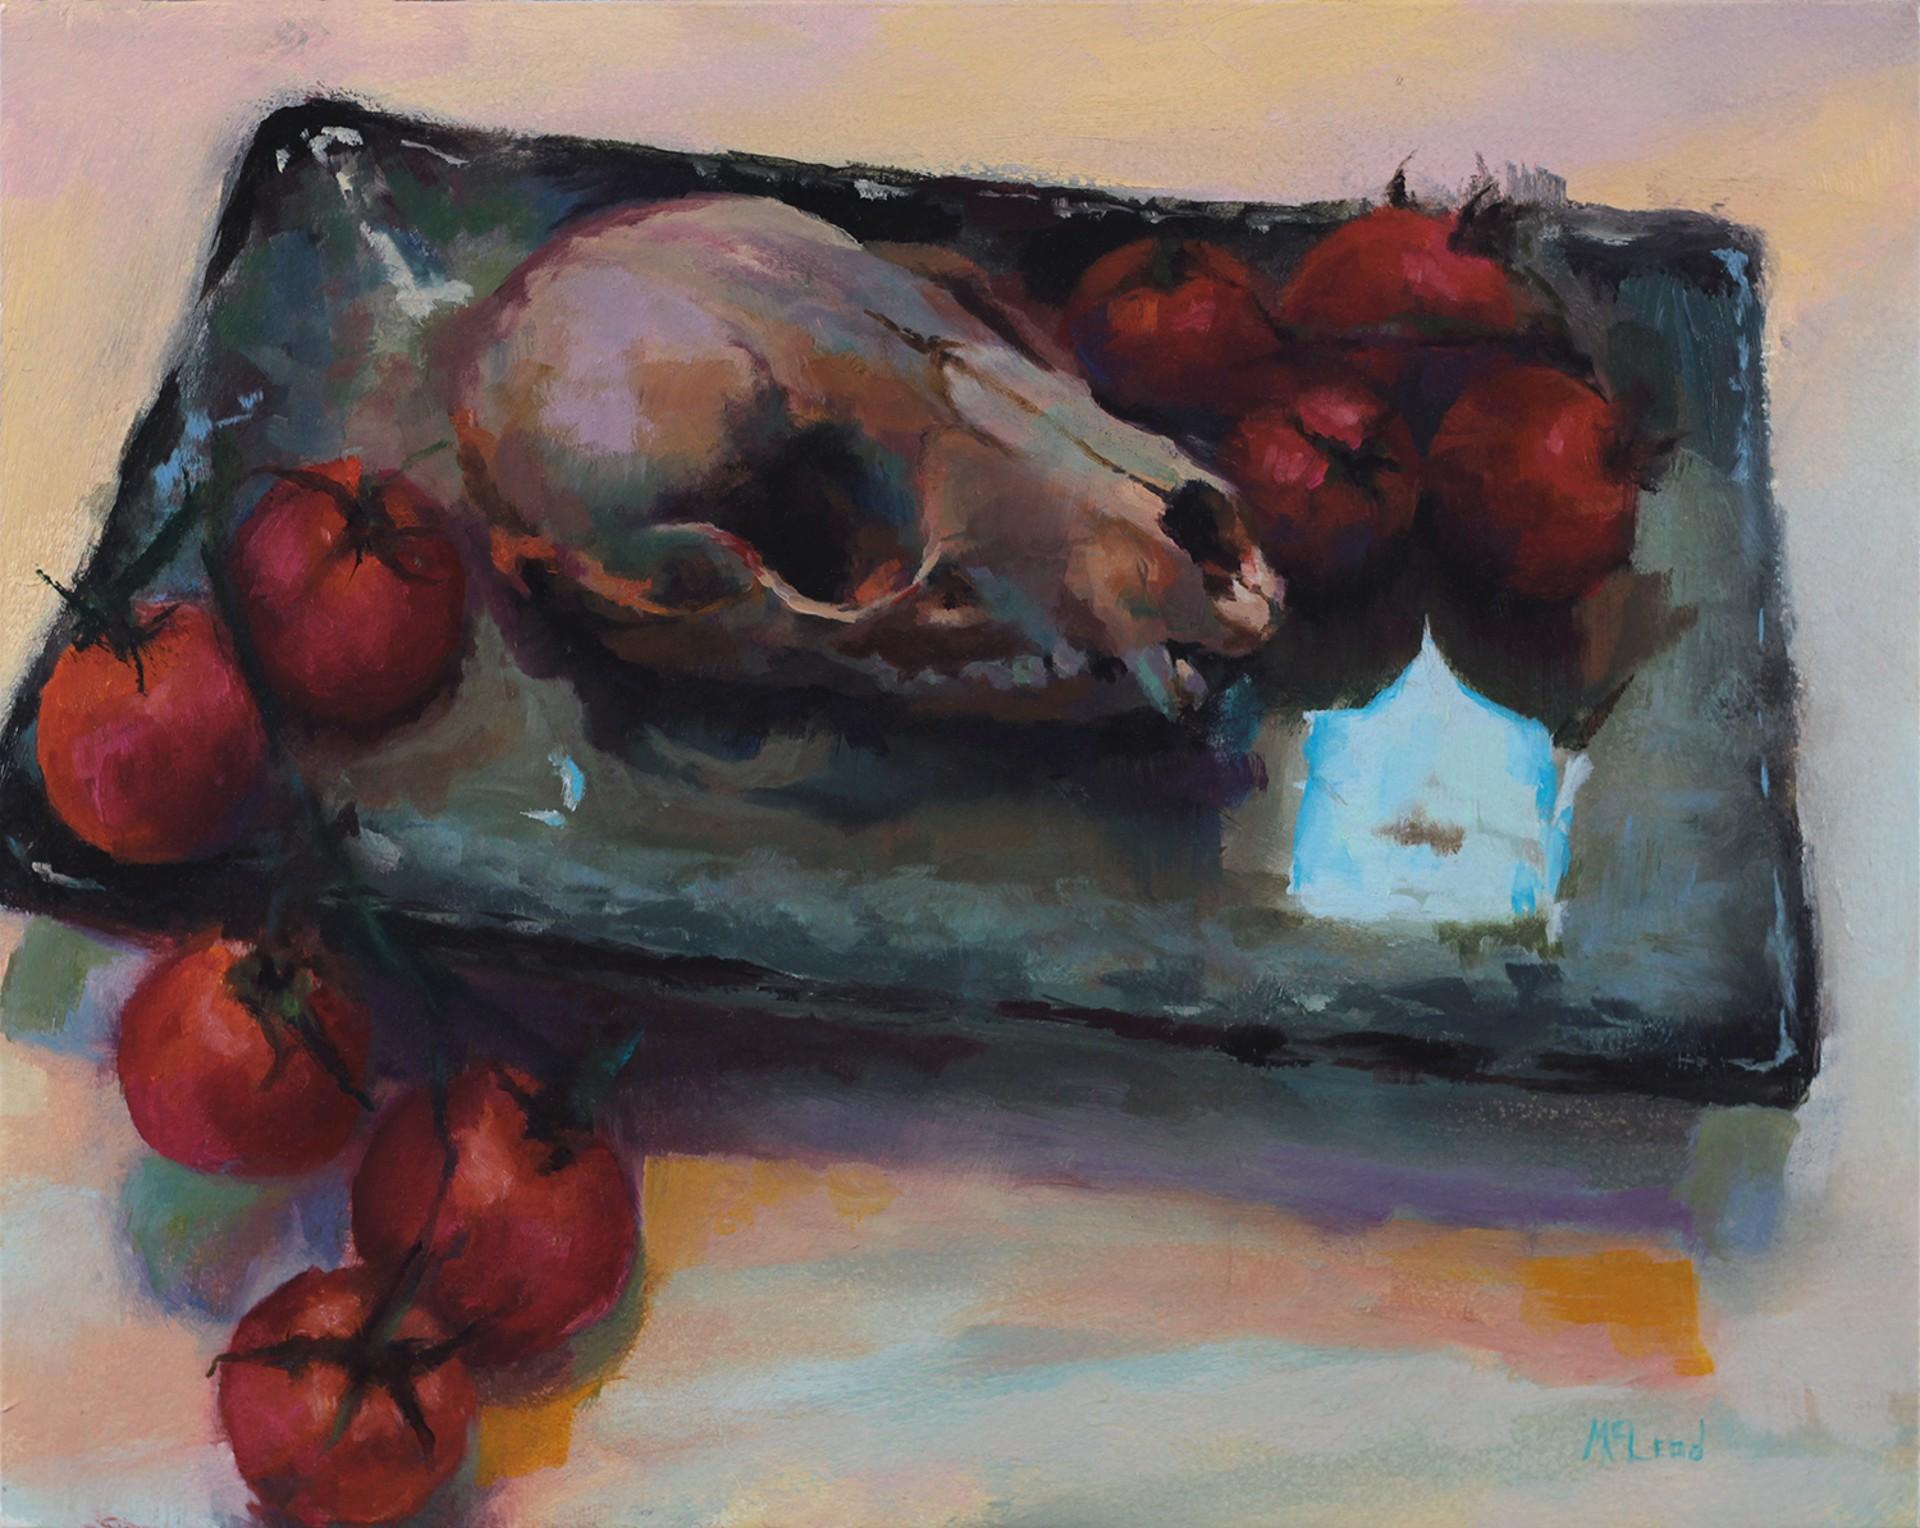 Vanitas by John McLeod